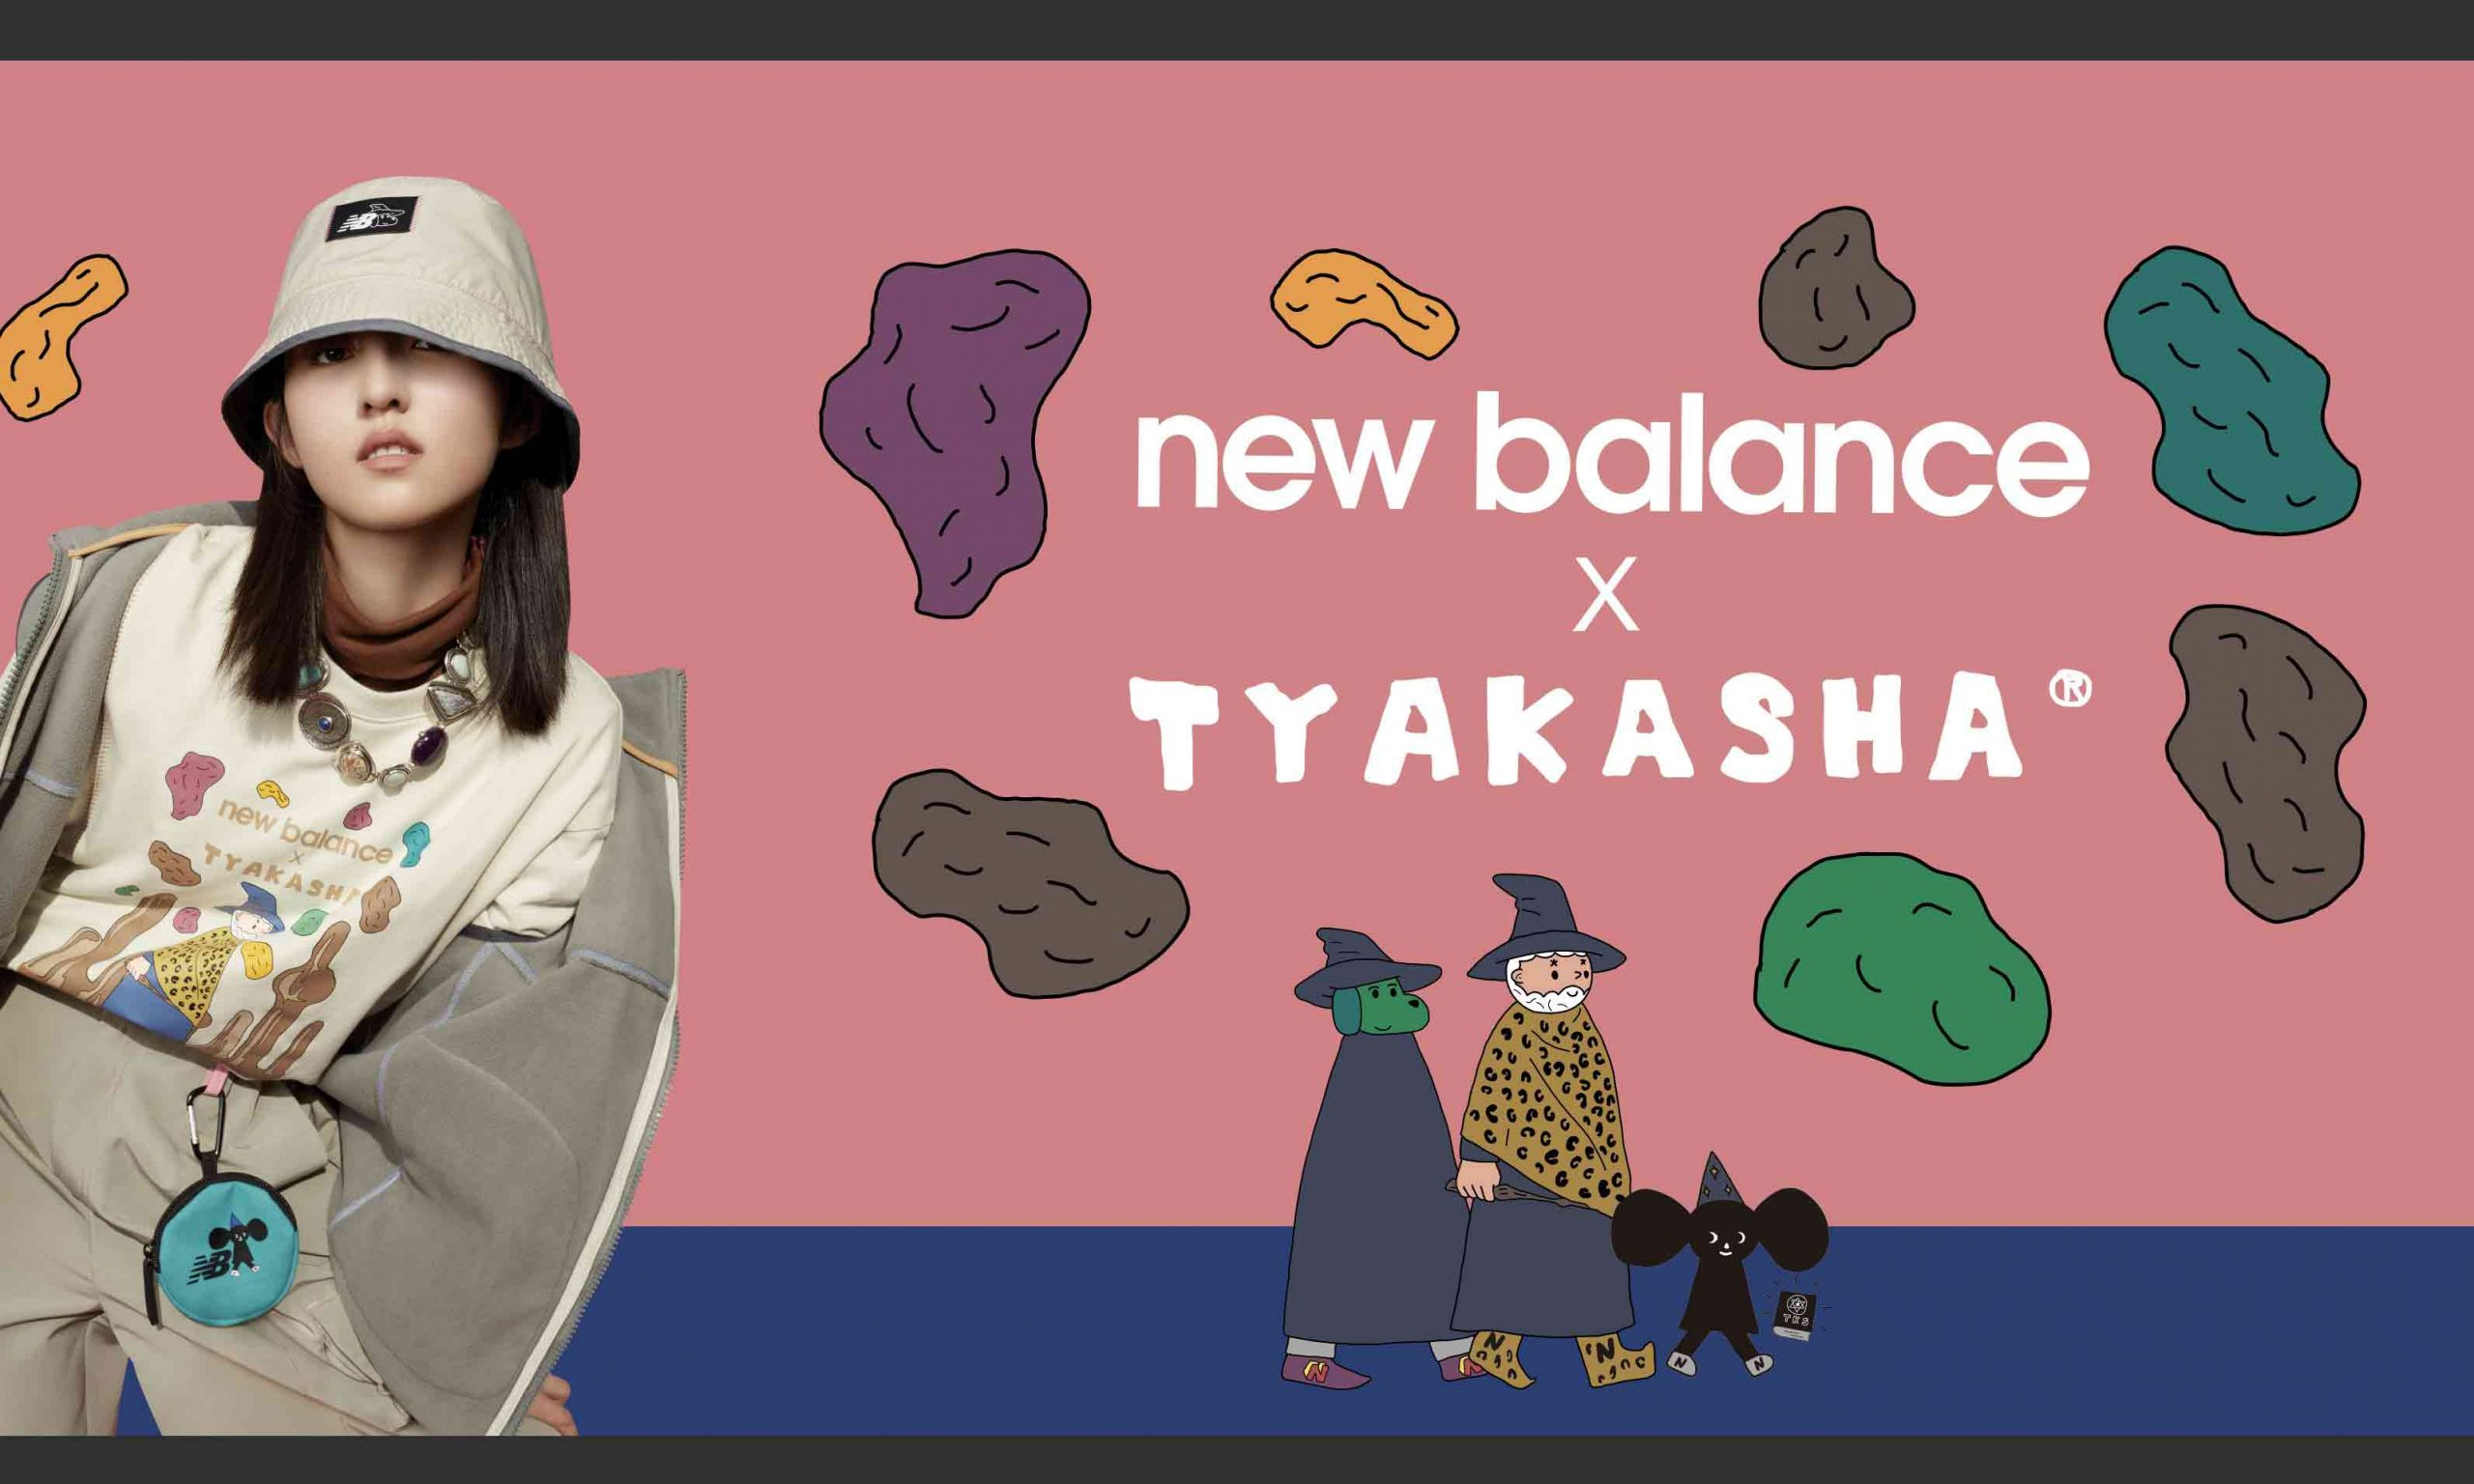 奇幻温暖,TYAKASHA x New Balance 魔法团联名系列上市